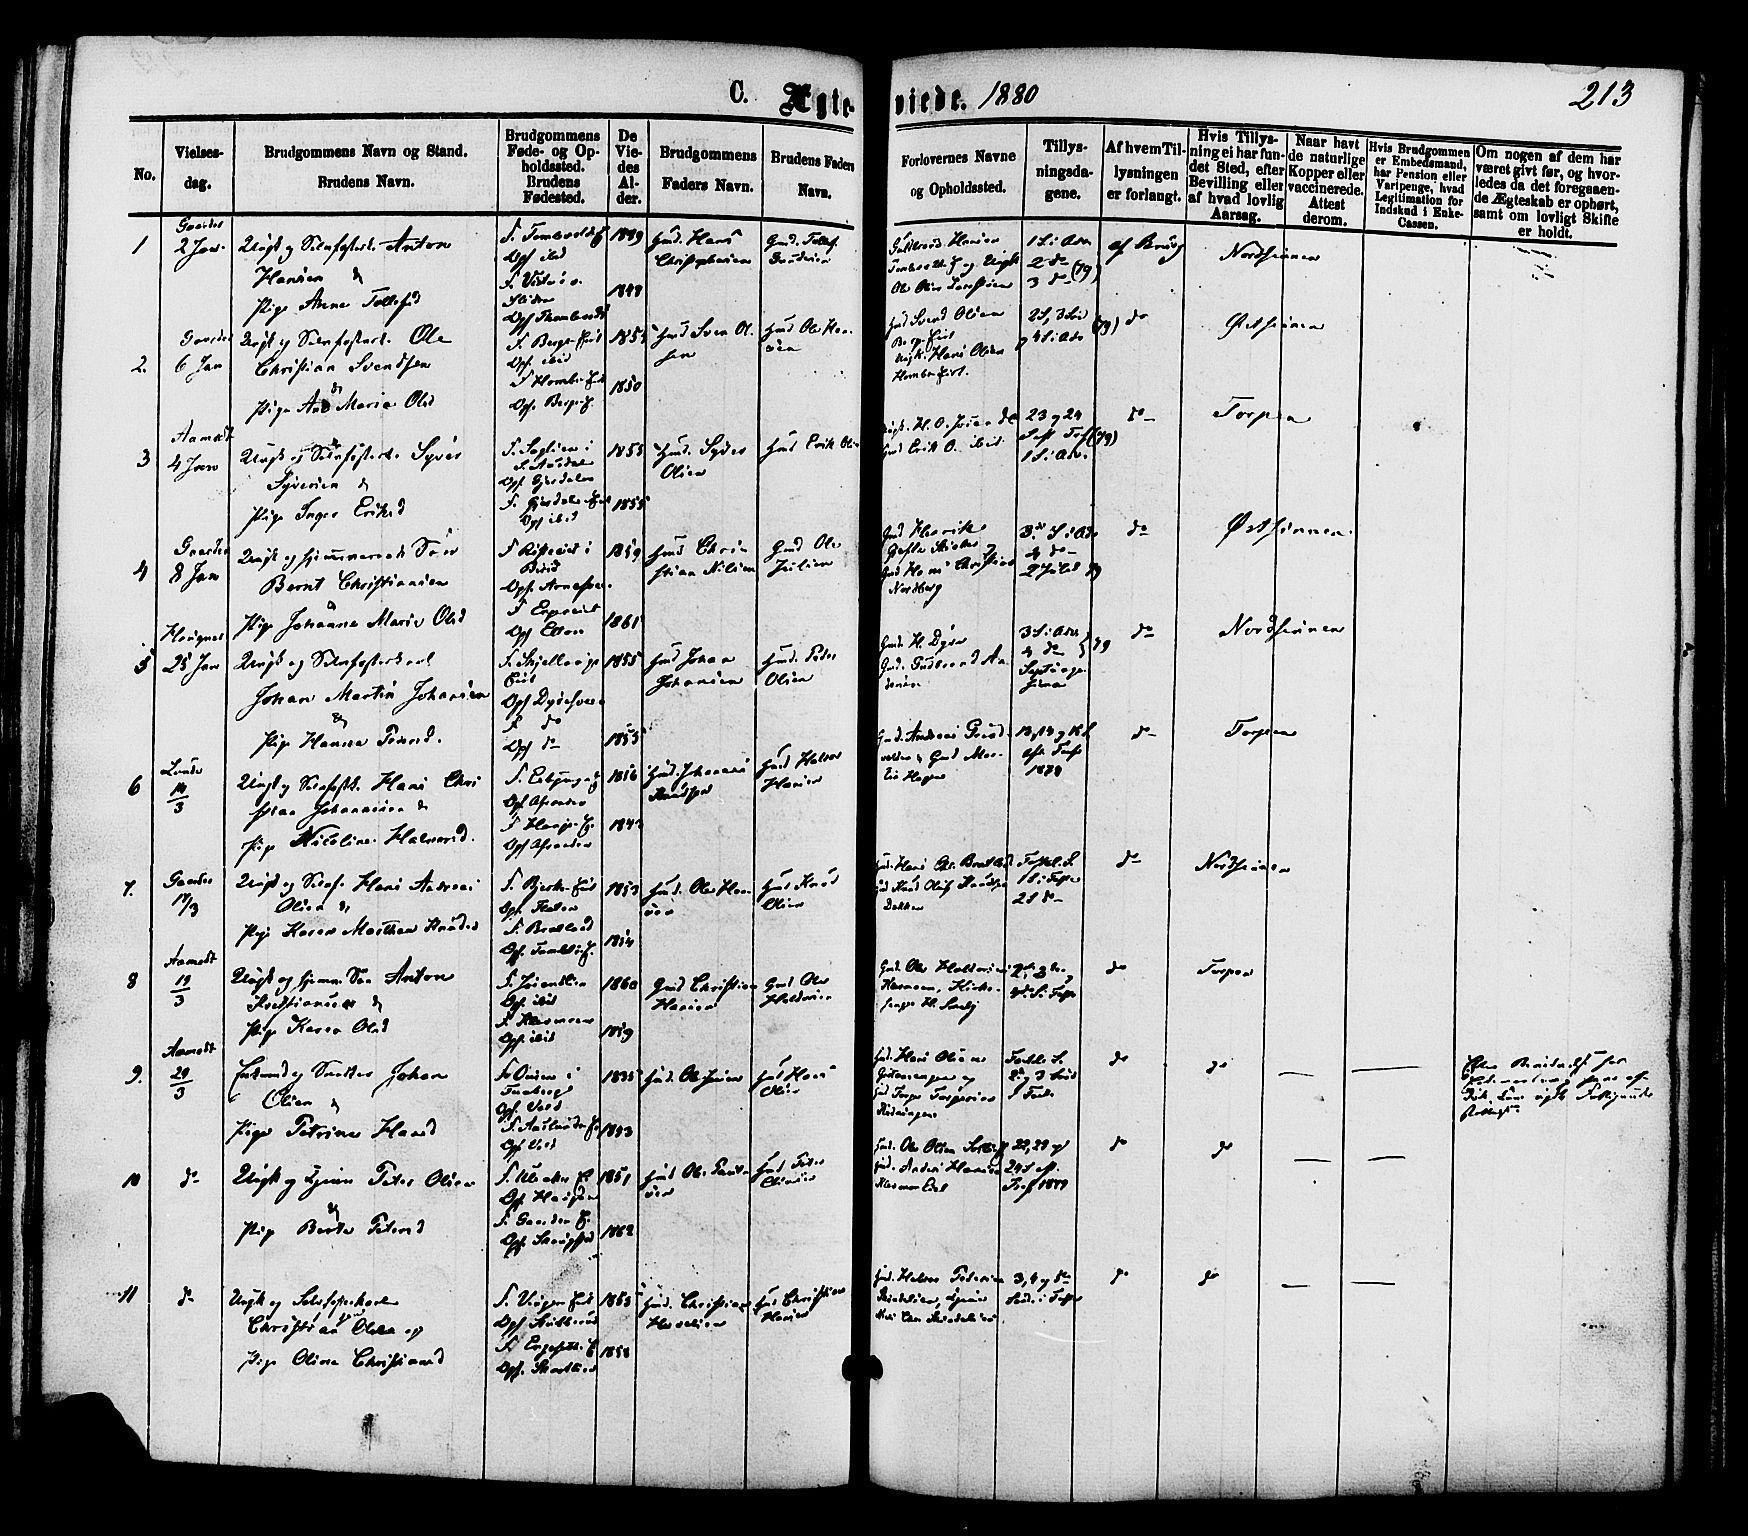 SAH, Nordre Land prestekontor, Ministerialbok nr. 2, 1872-1881, s. 213